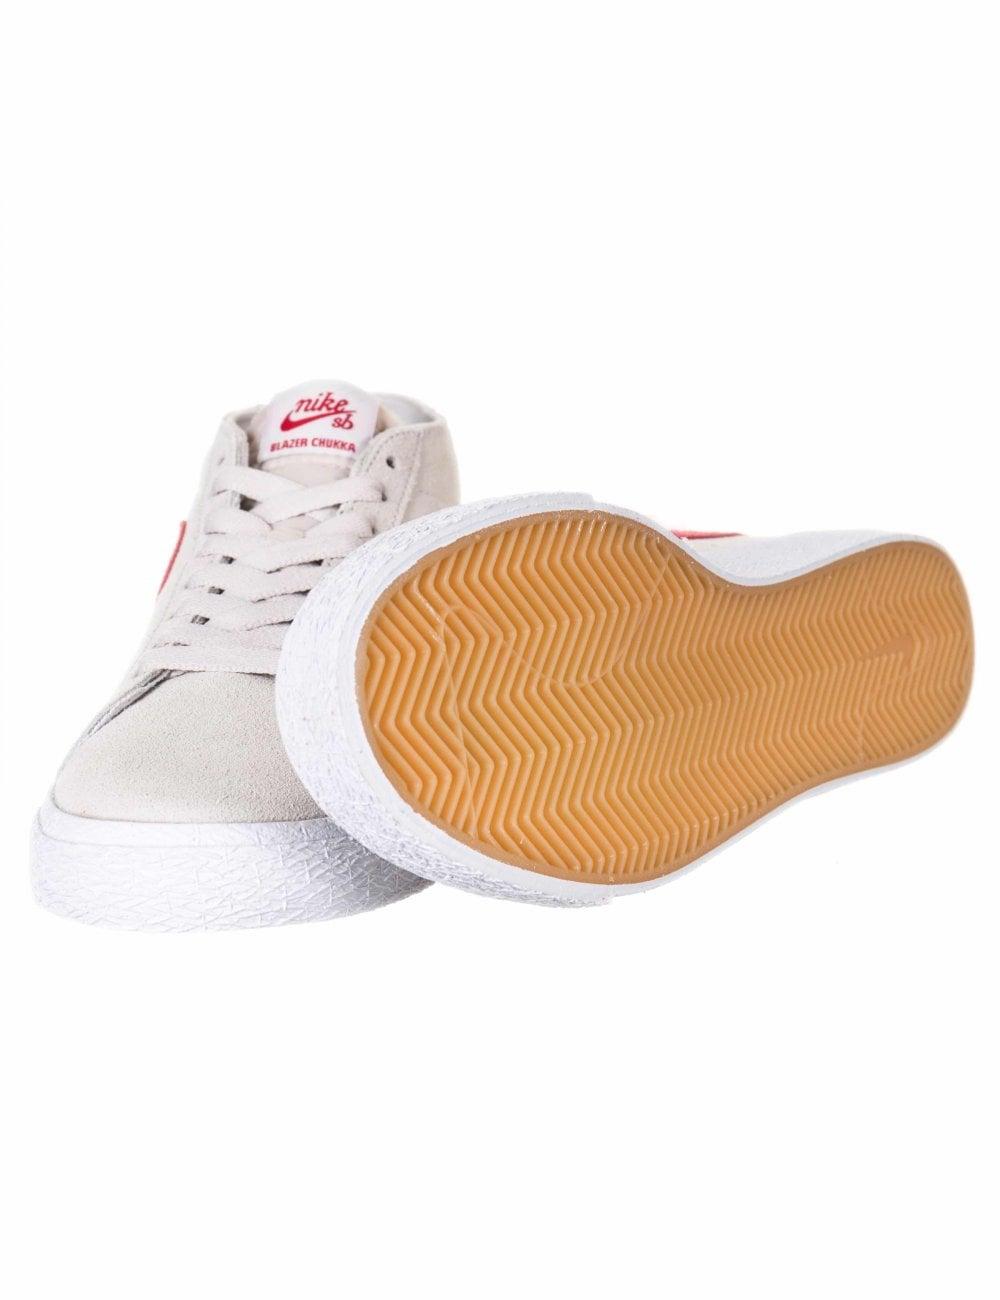 69c558e6 Nike SB Zoom Blazer Chukka Trainers - Vast Grey/Team Crimson ...